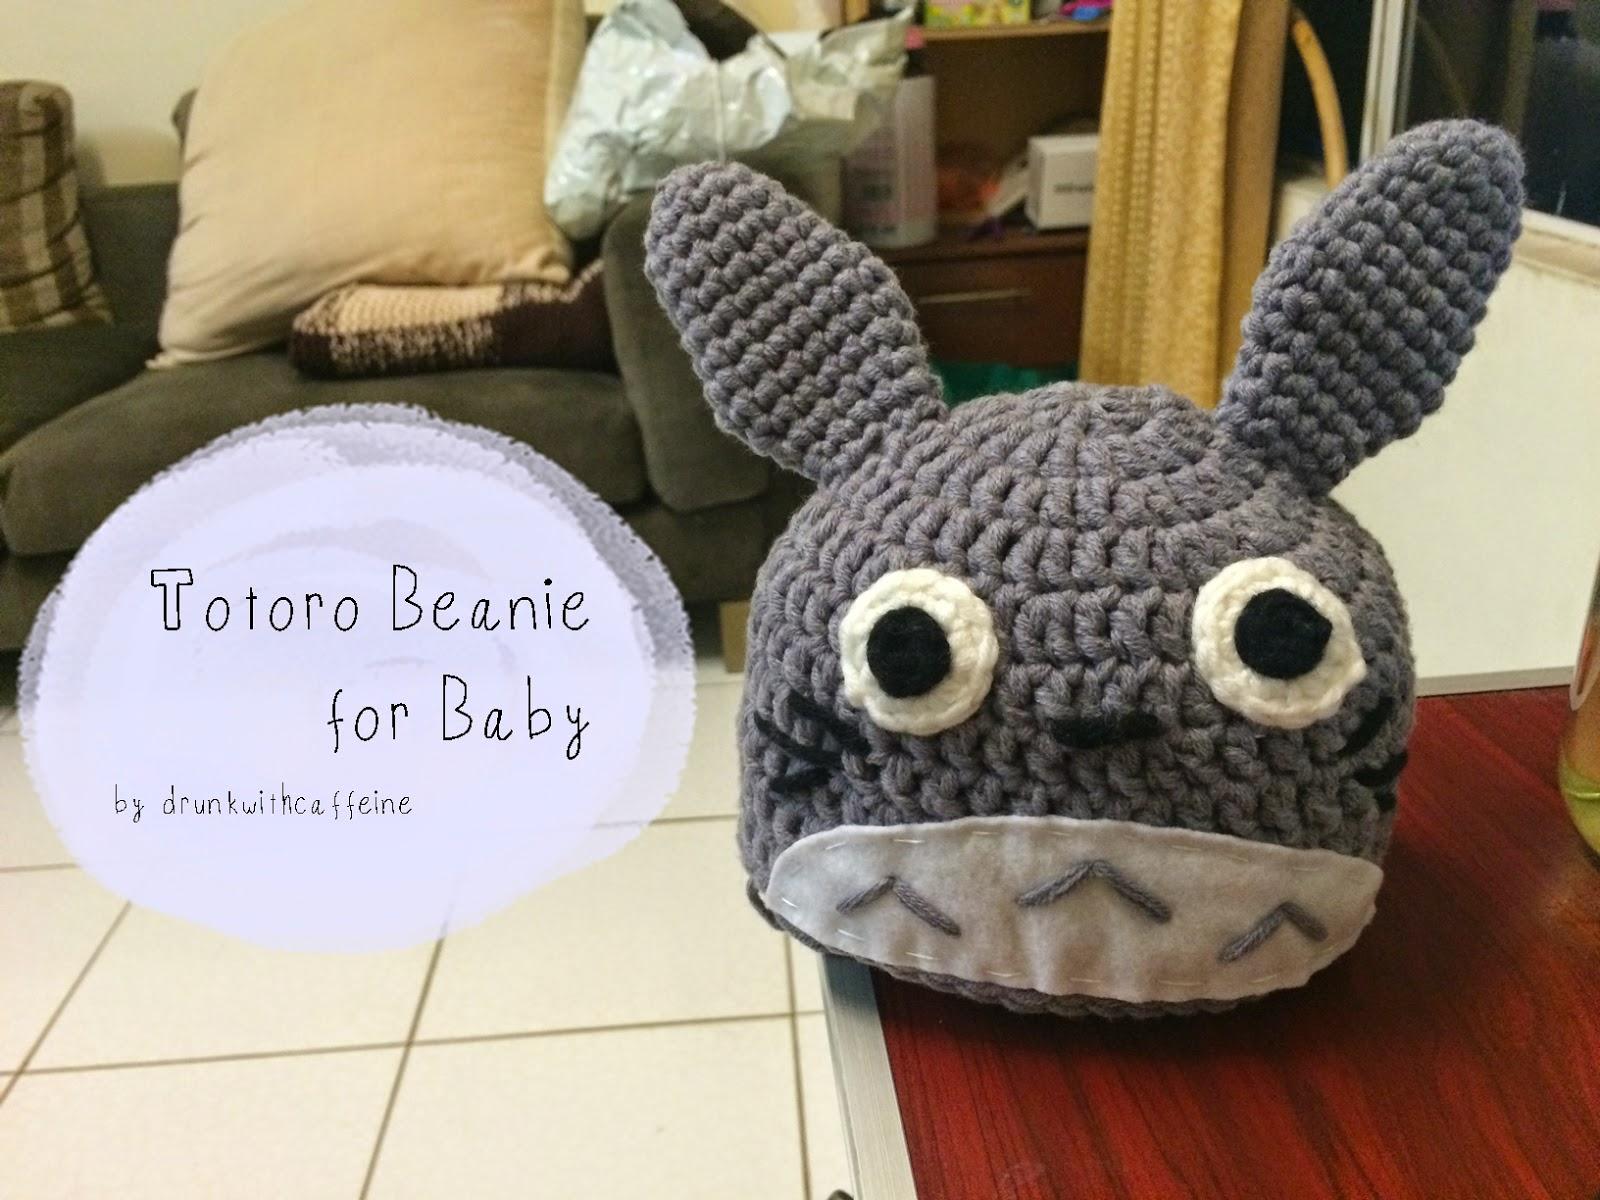 Drunk with caffeine crochet pattern totoro beanie for babies crochet pattern totoro beanie for babies dt1010fo